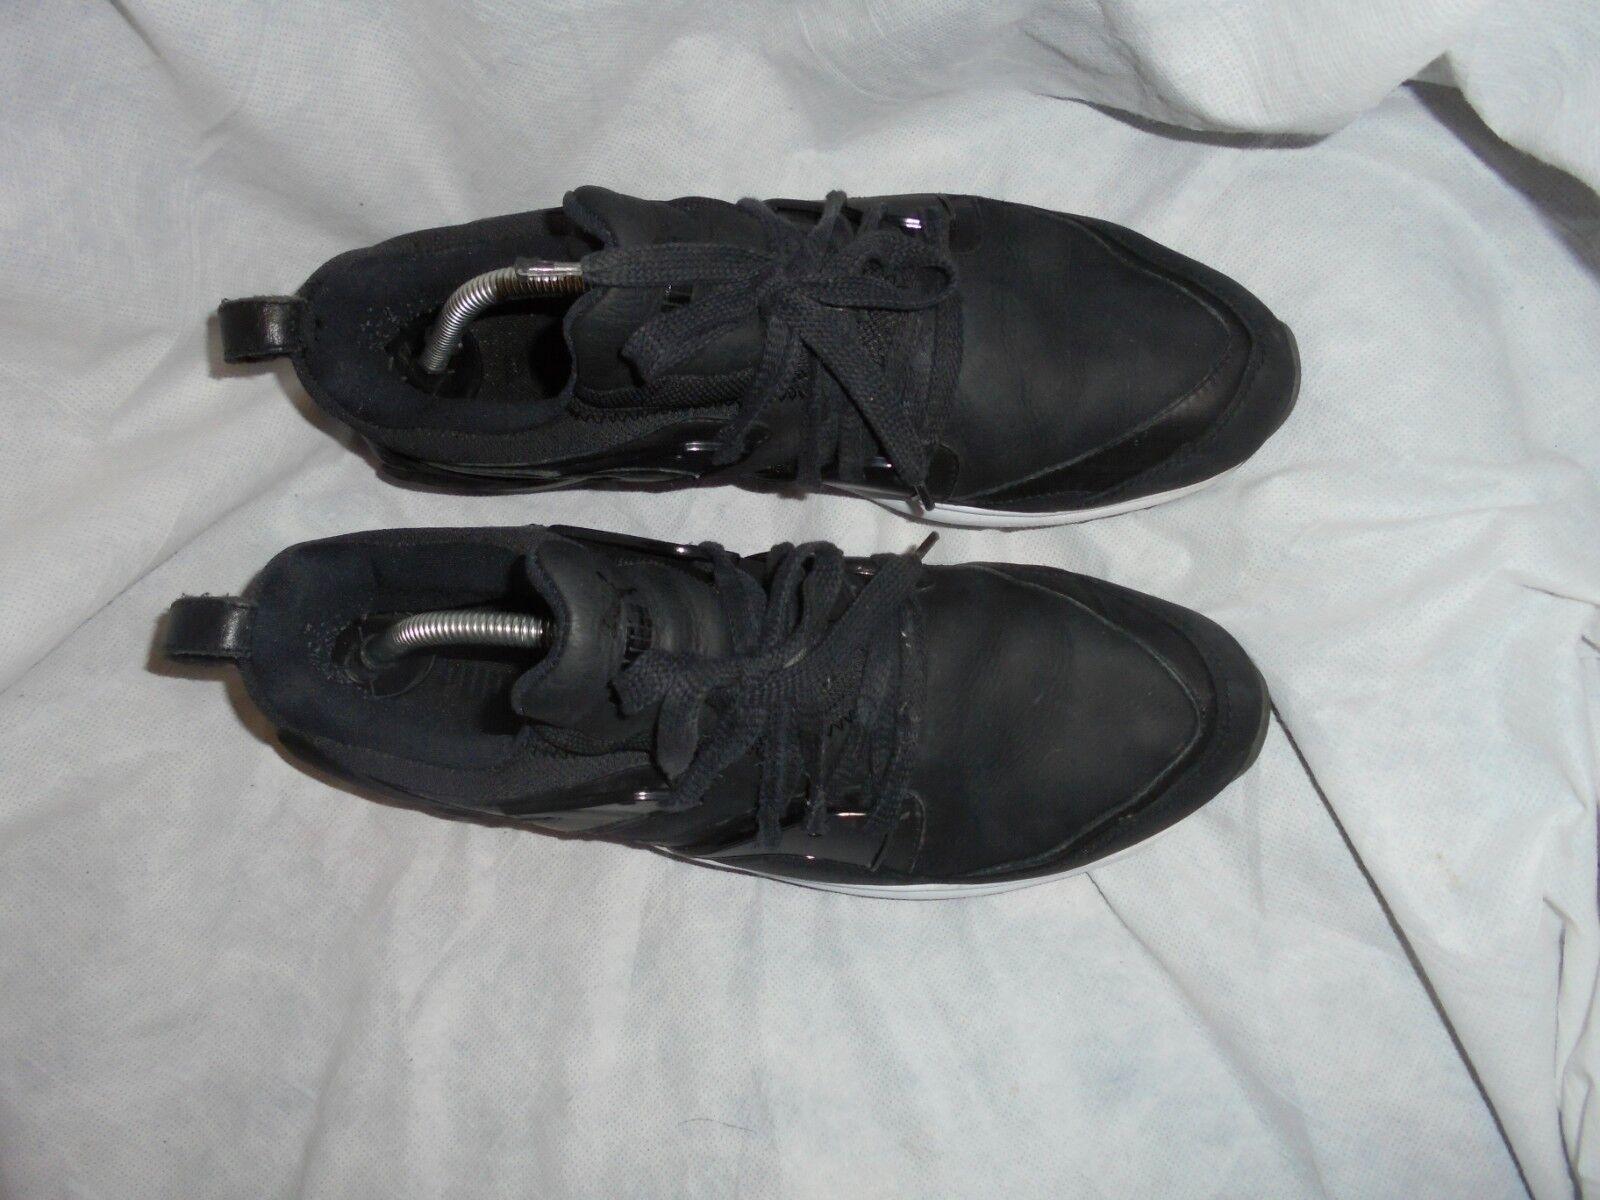 PUMA MEN BLACK LEATHER LACE UP 9 WALKING TRAINERS SIZE UK 9 UP EU 43 VGC 3f37b8